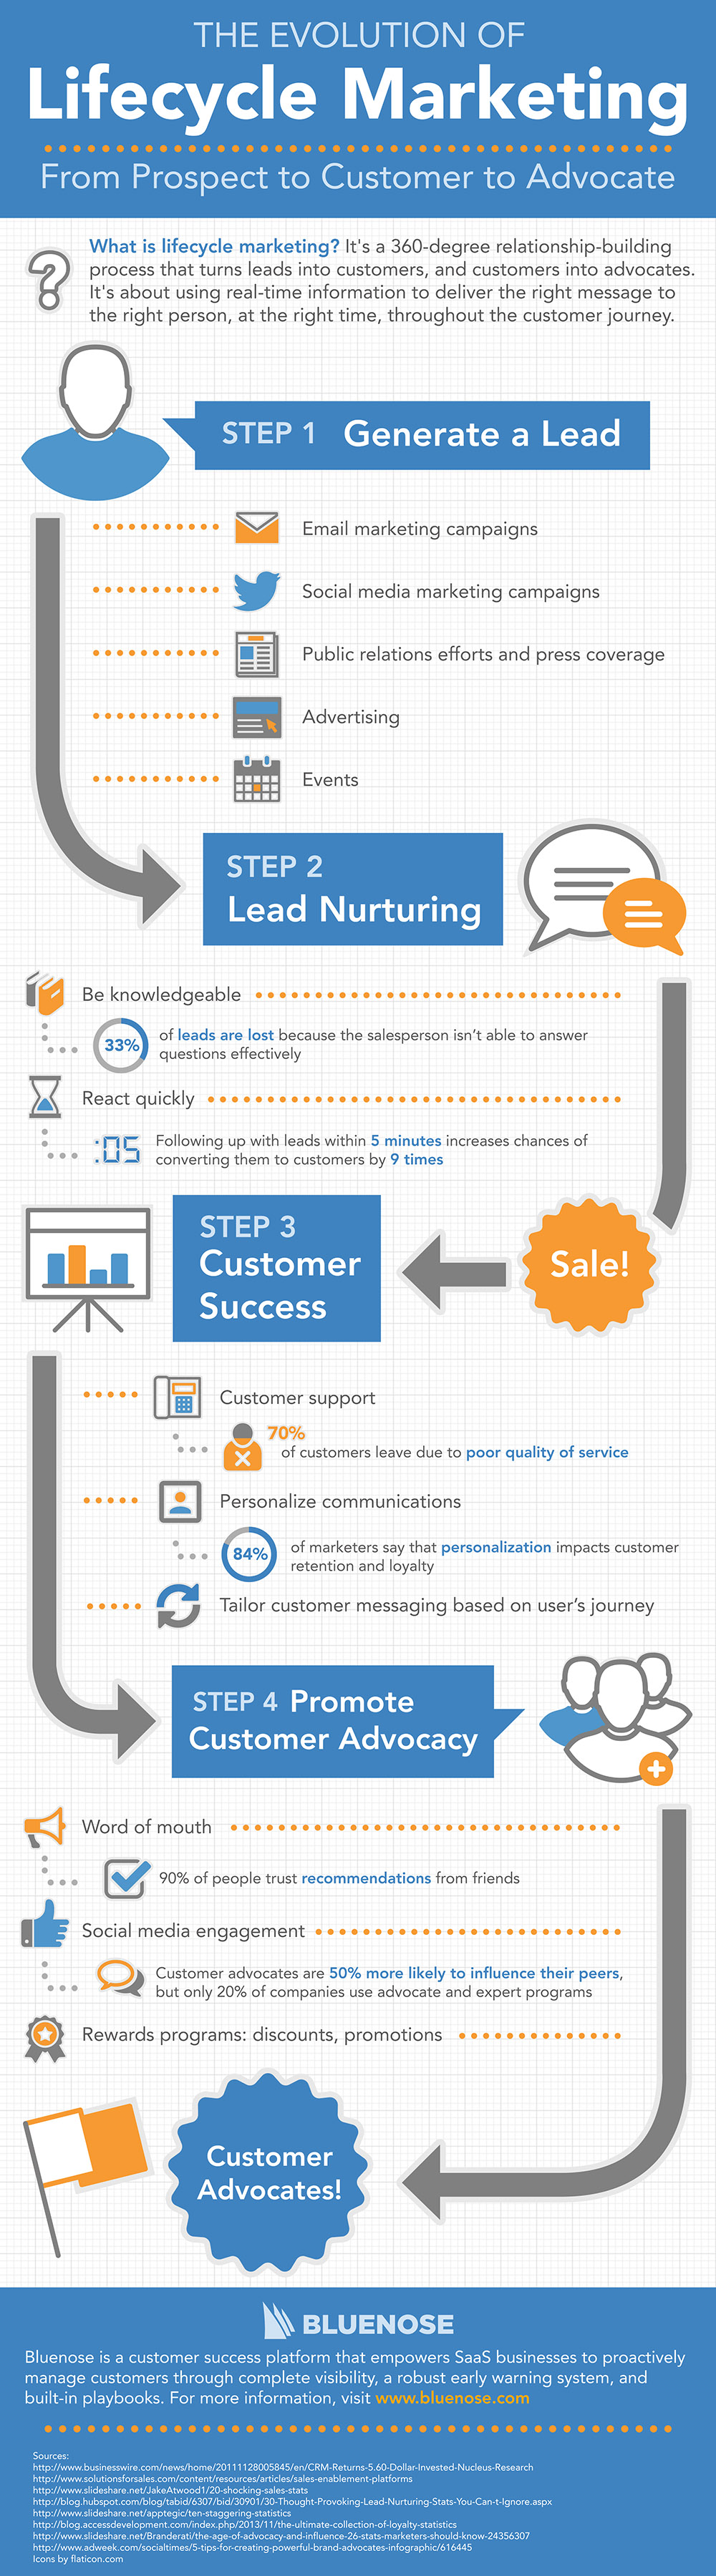 Lifecycle_Marketing.jpg